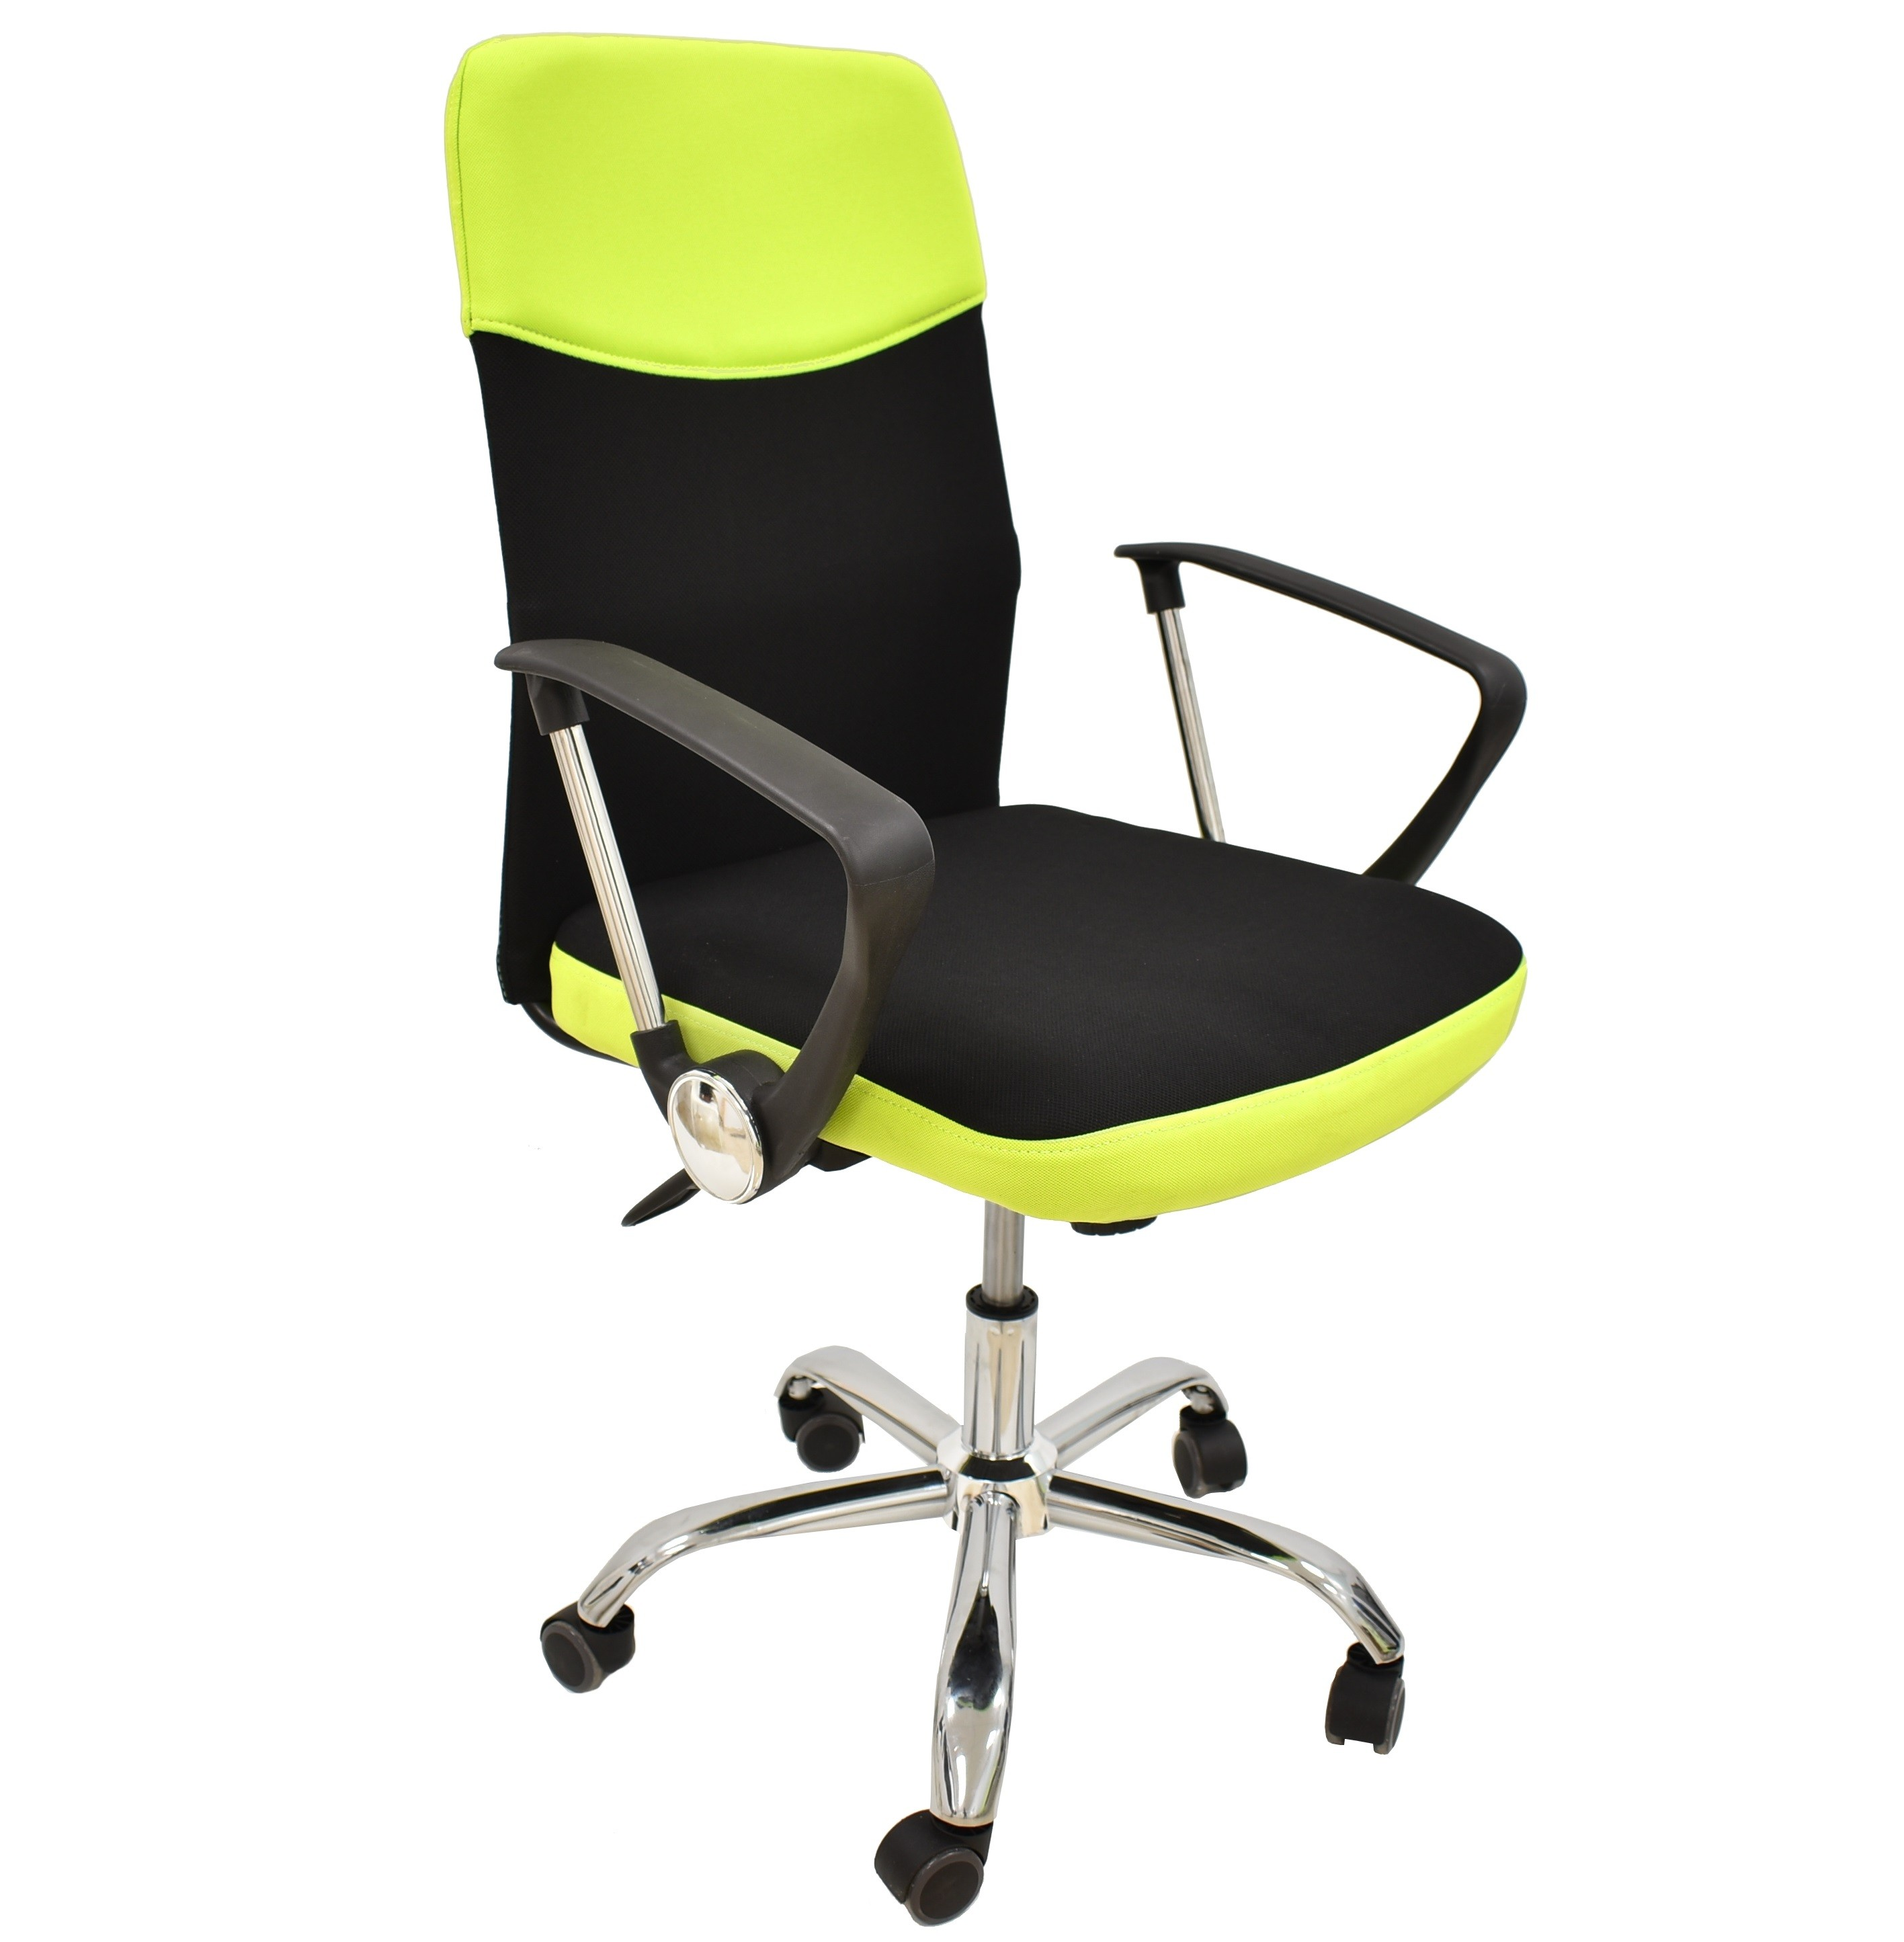 Office Armchair TANGO, Gas, Tilt, Fabric Black Green